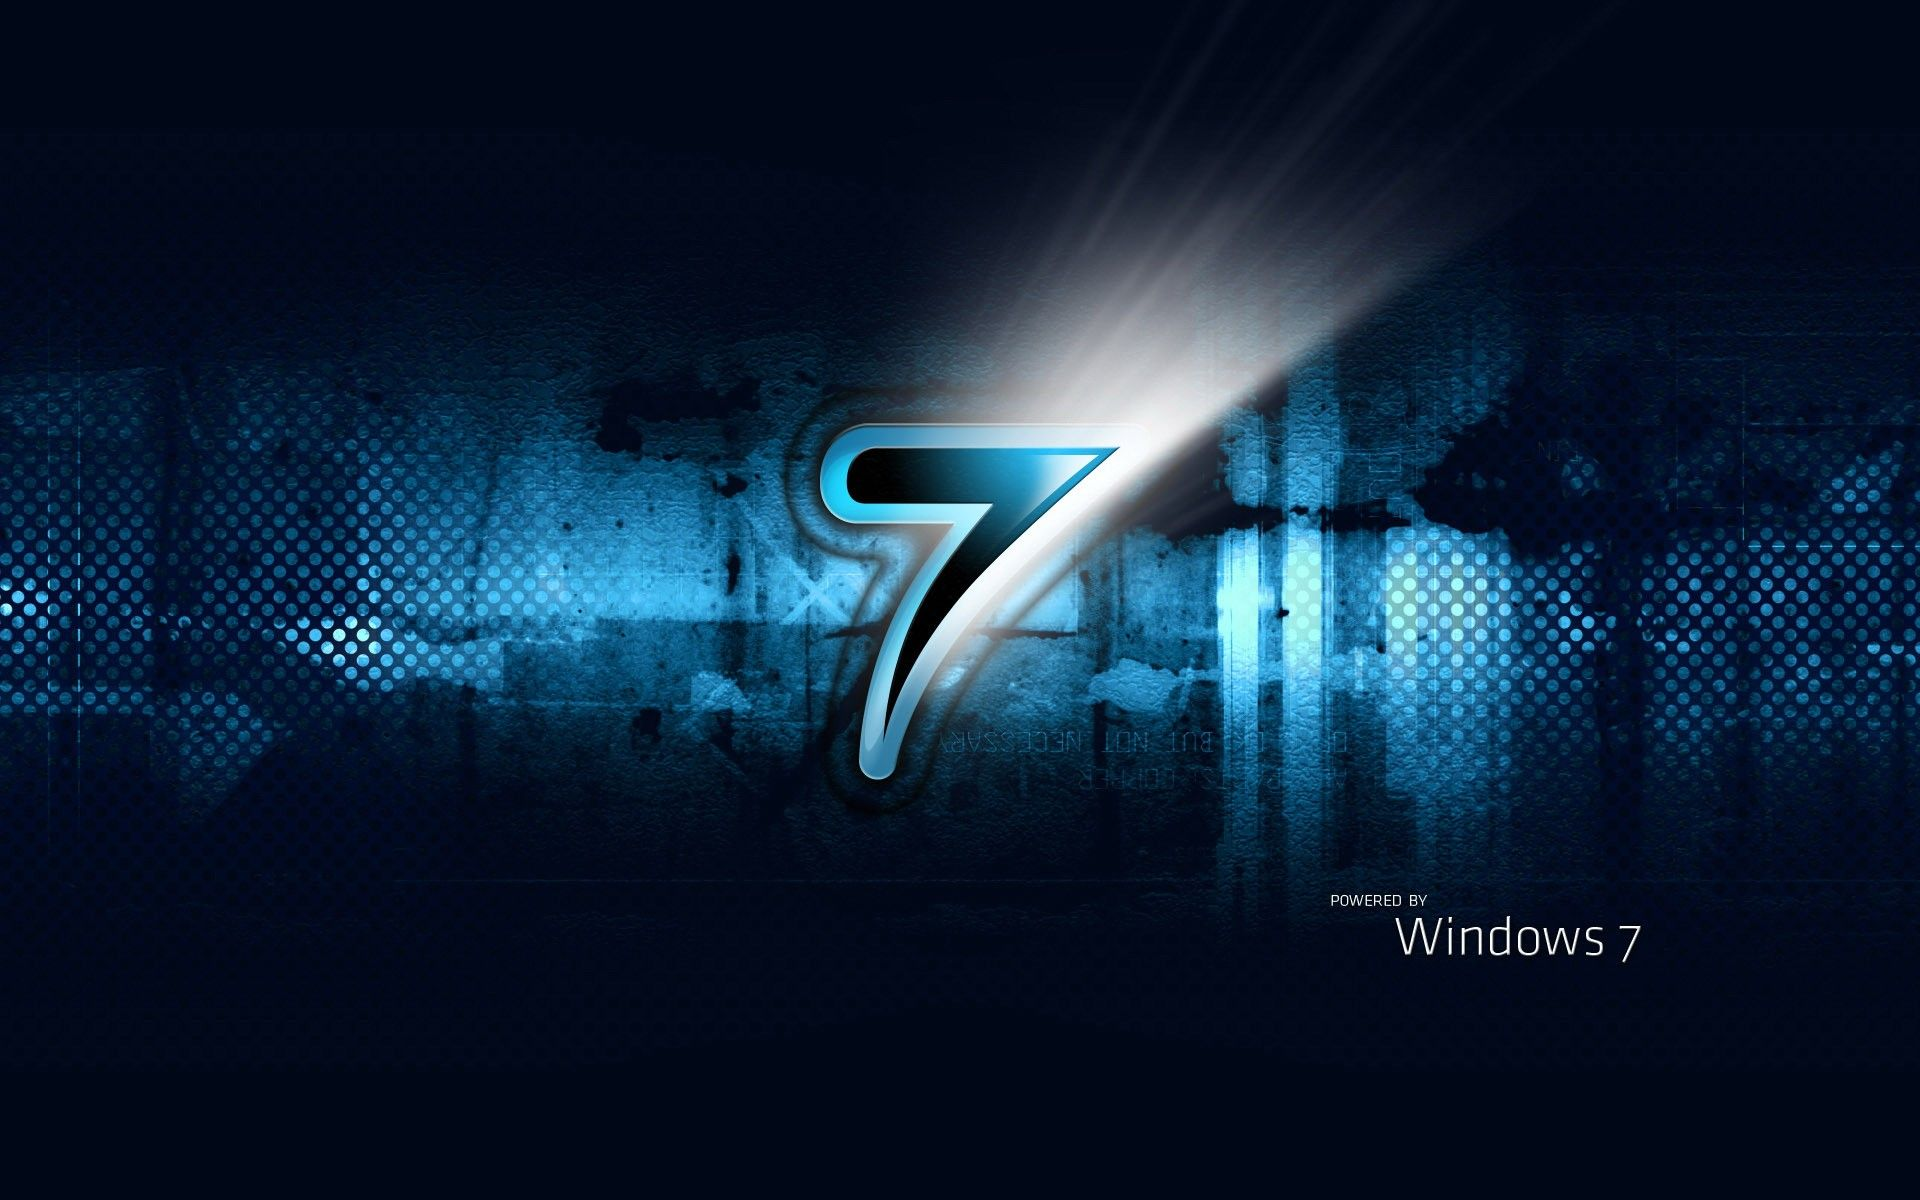 Powered By Windows Seven 1920x1200 Hd Wallpaper Hd Wallpaper Desktop Windows Wallpaper Computer Wallpaper